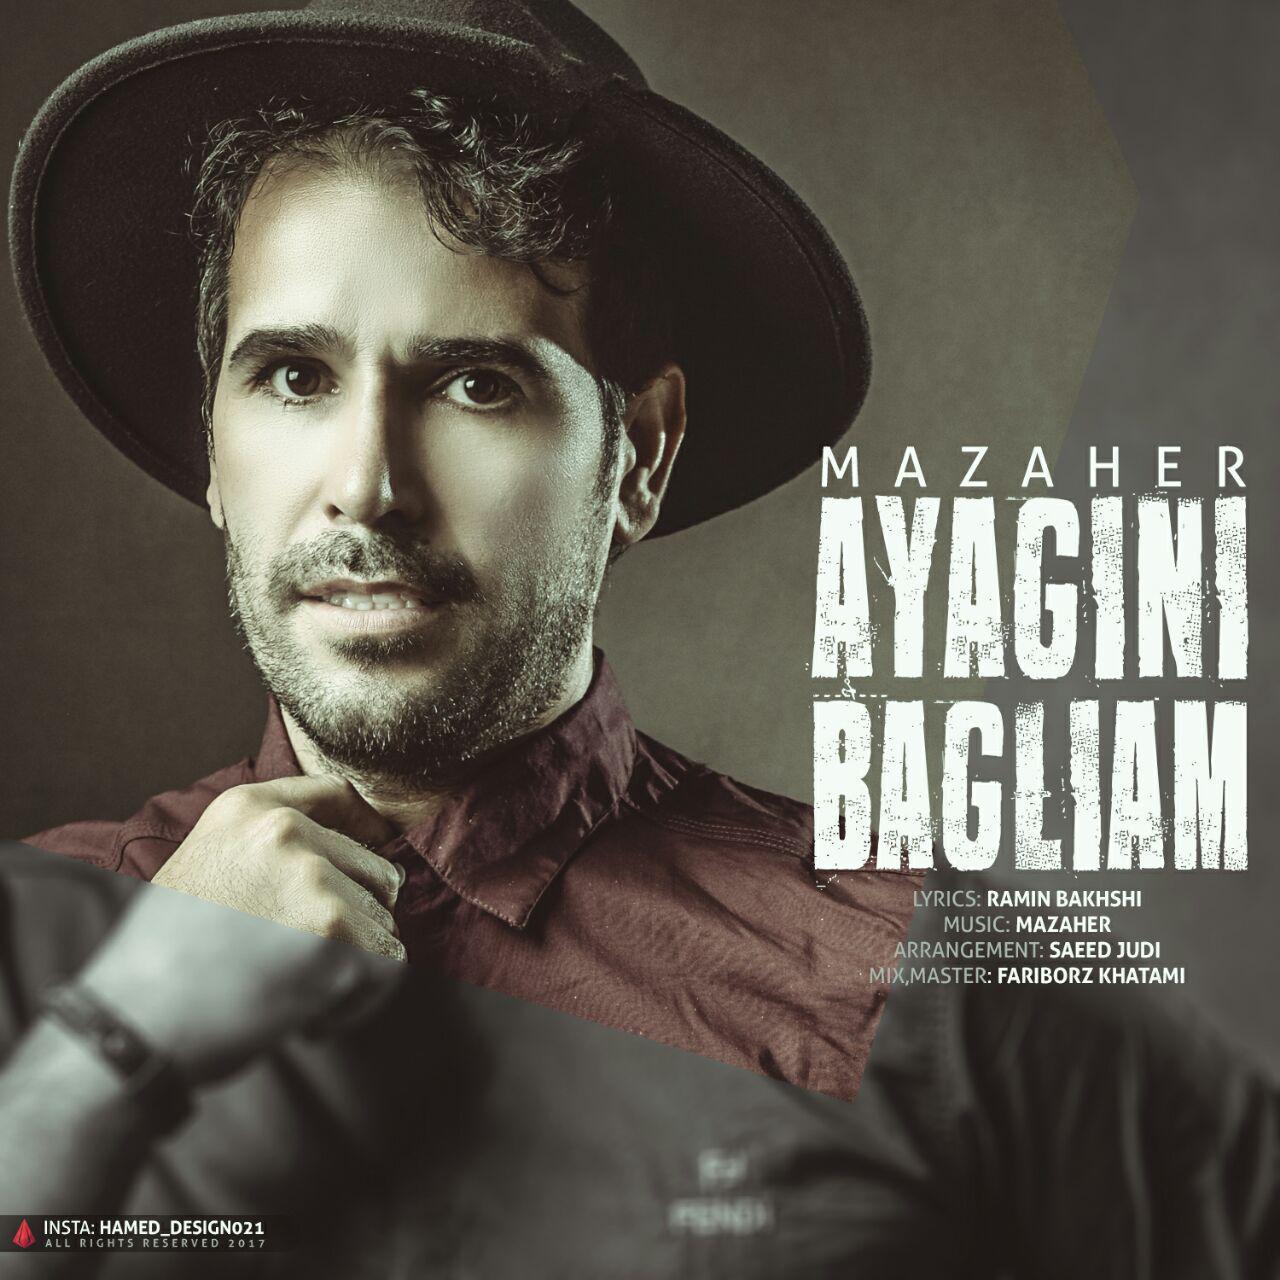 http://s8.picofile.com/file/8313354800/15Mazaher_Ayagini_Bagliam.jpg